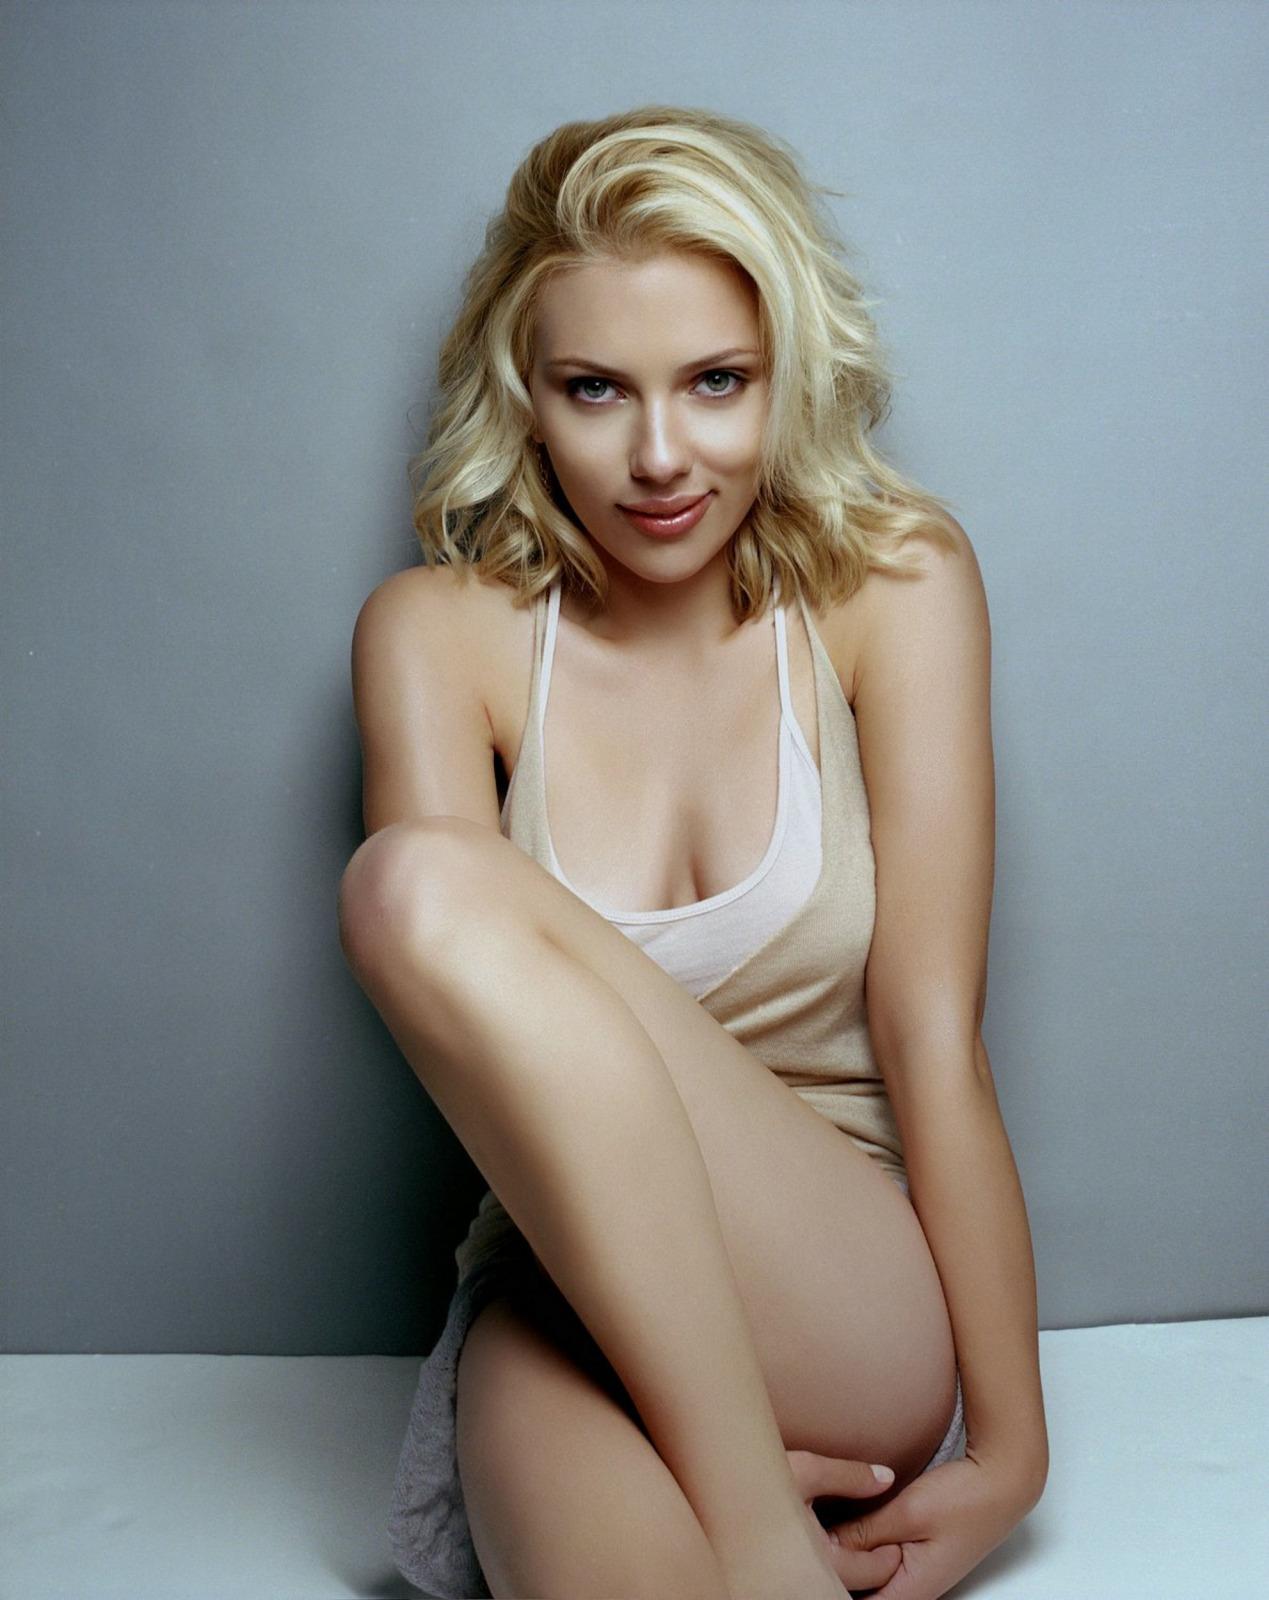 http://2.bp.blogspot.com/-ddylpF74EJA/T1tBxj0OghI/AAAAAAAAKkY/zghS24B8cVY/s1600/Scarlett-Johansson-2.jpg